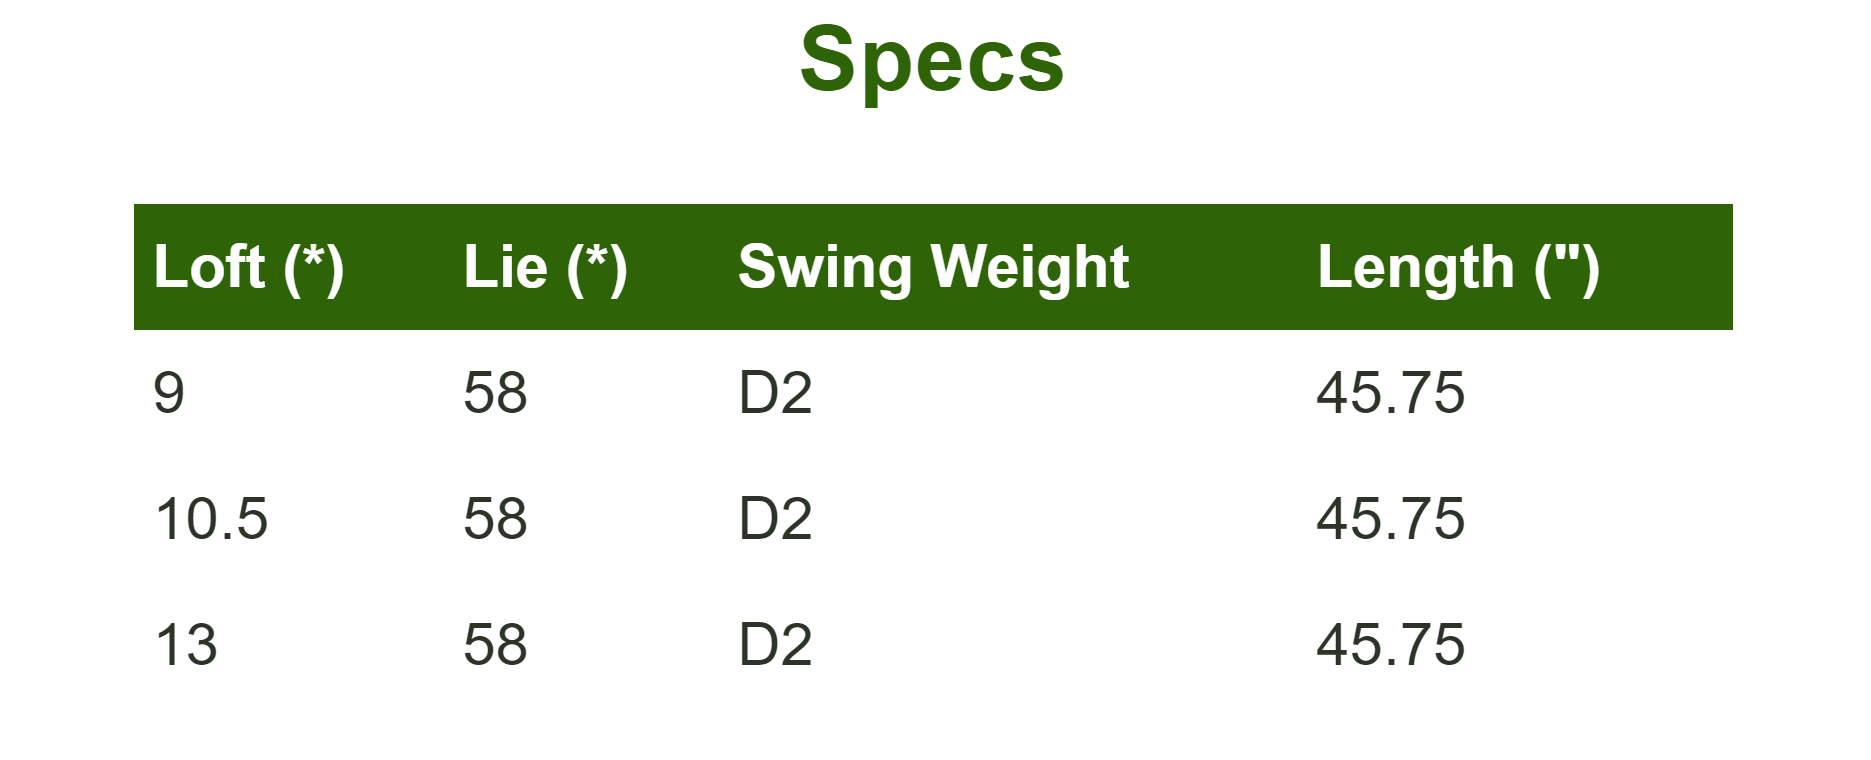 Wilson D7 driver specs image